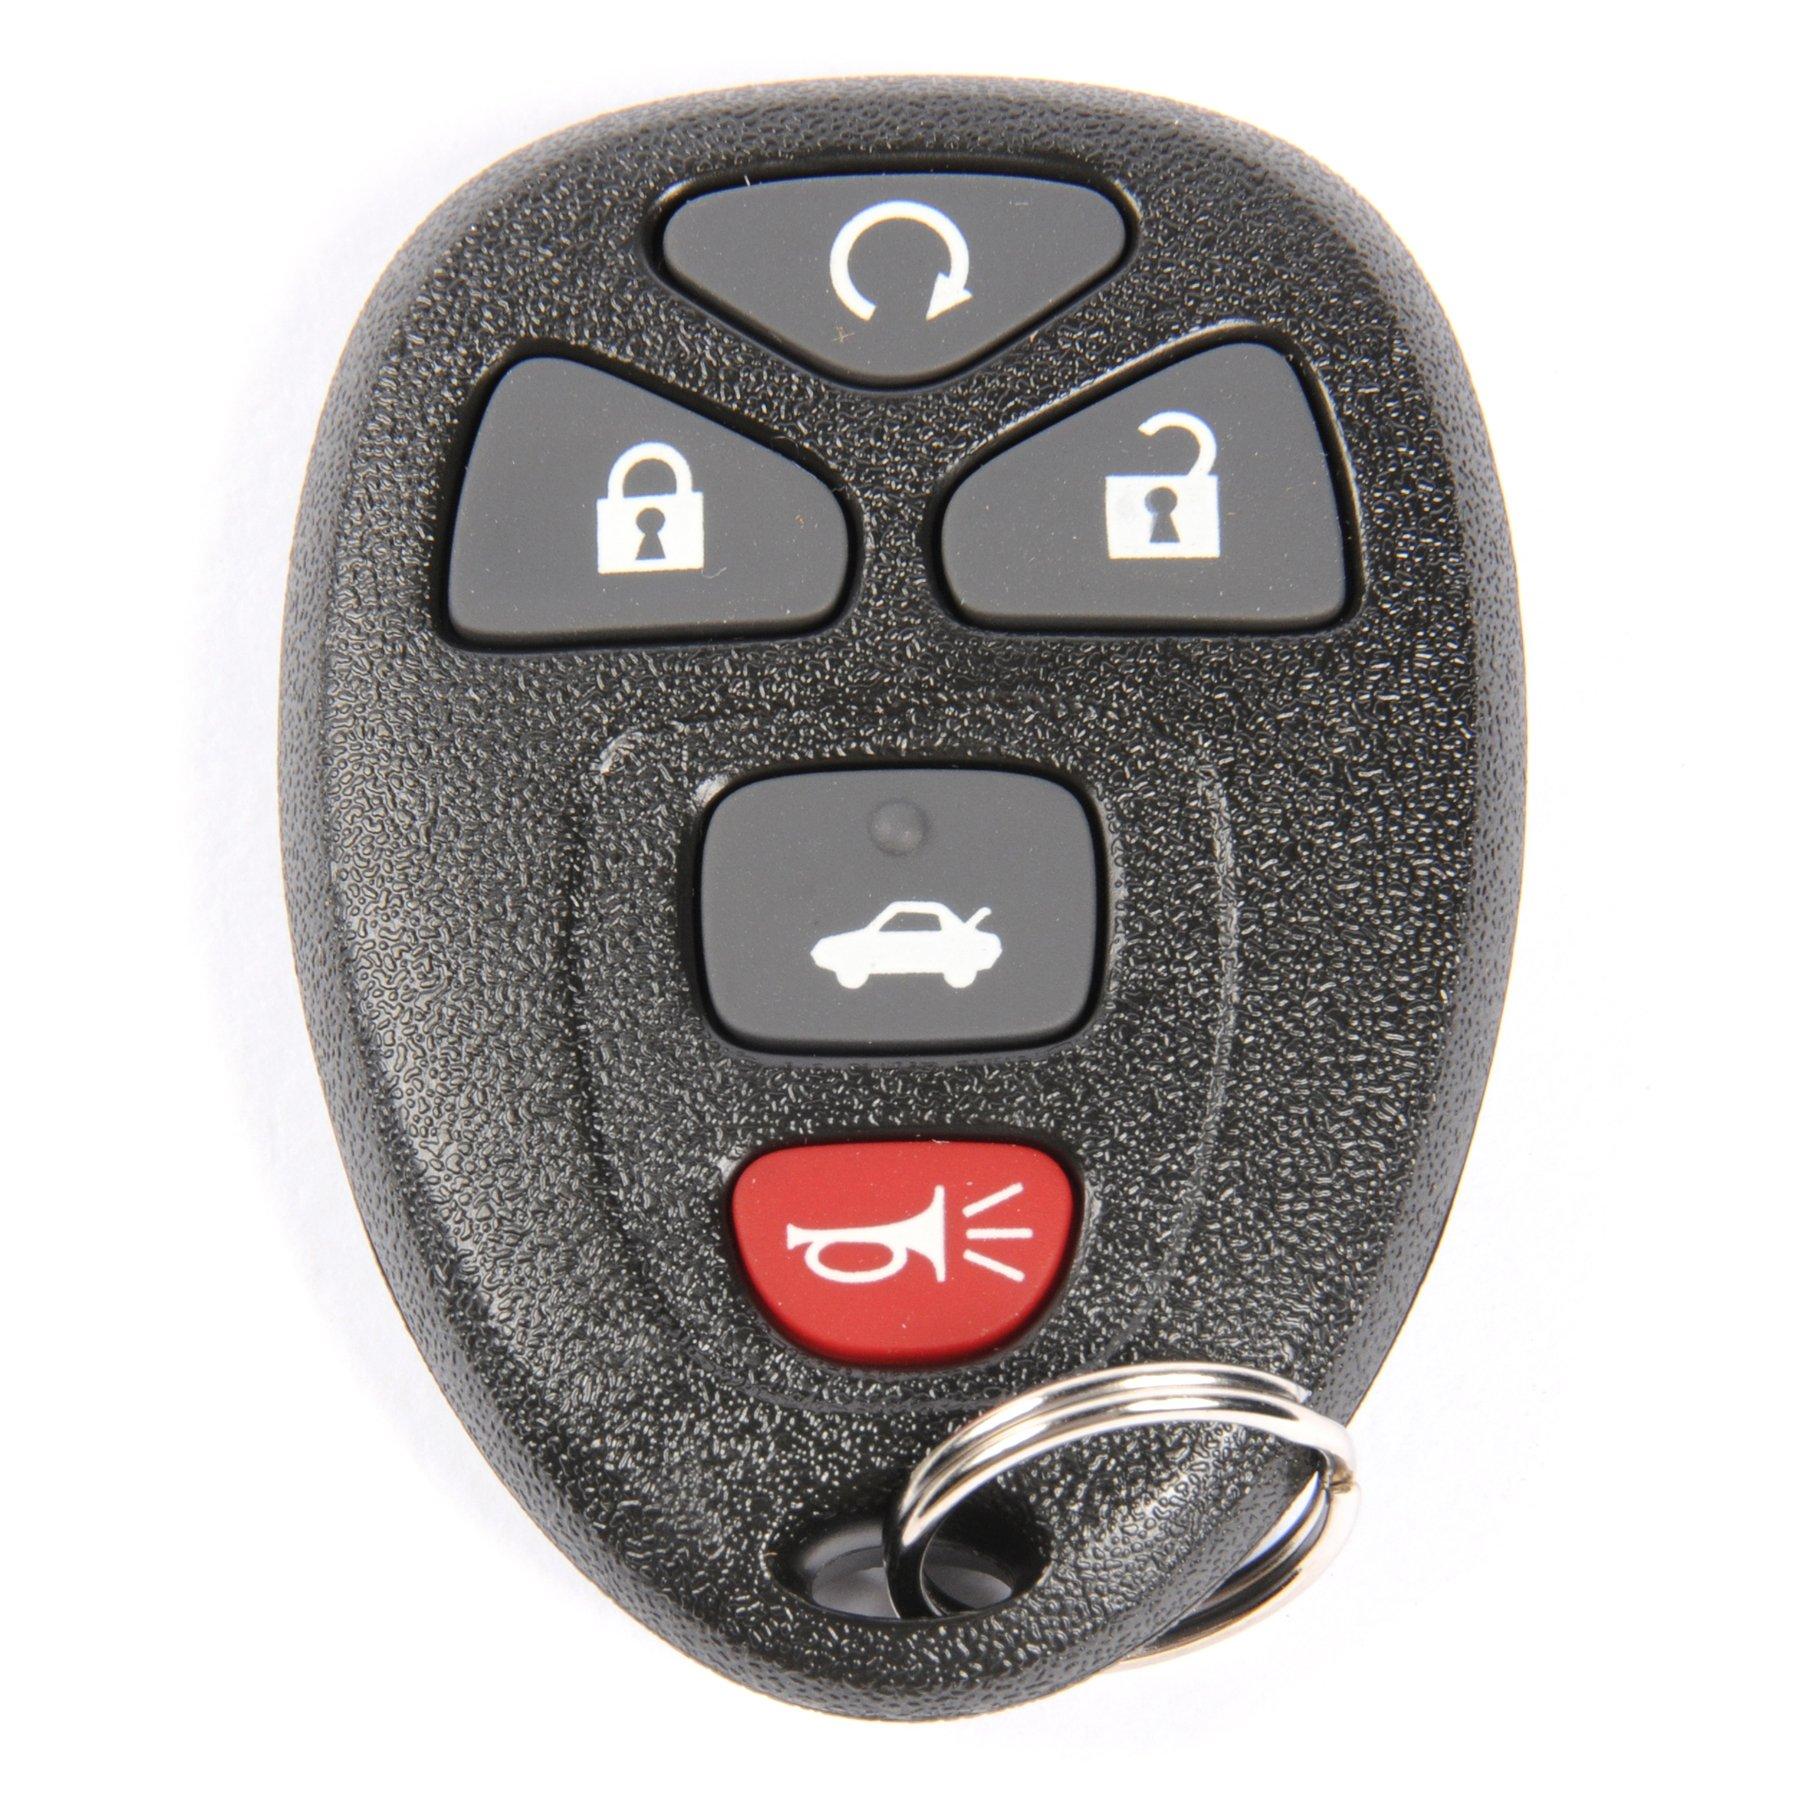 ACDelco 22733524 GM Original Equipment 5 Button Keyless Entry Remote Key Fob